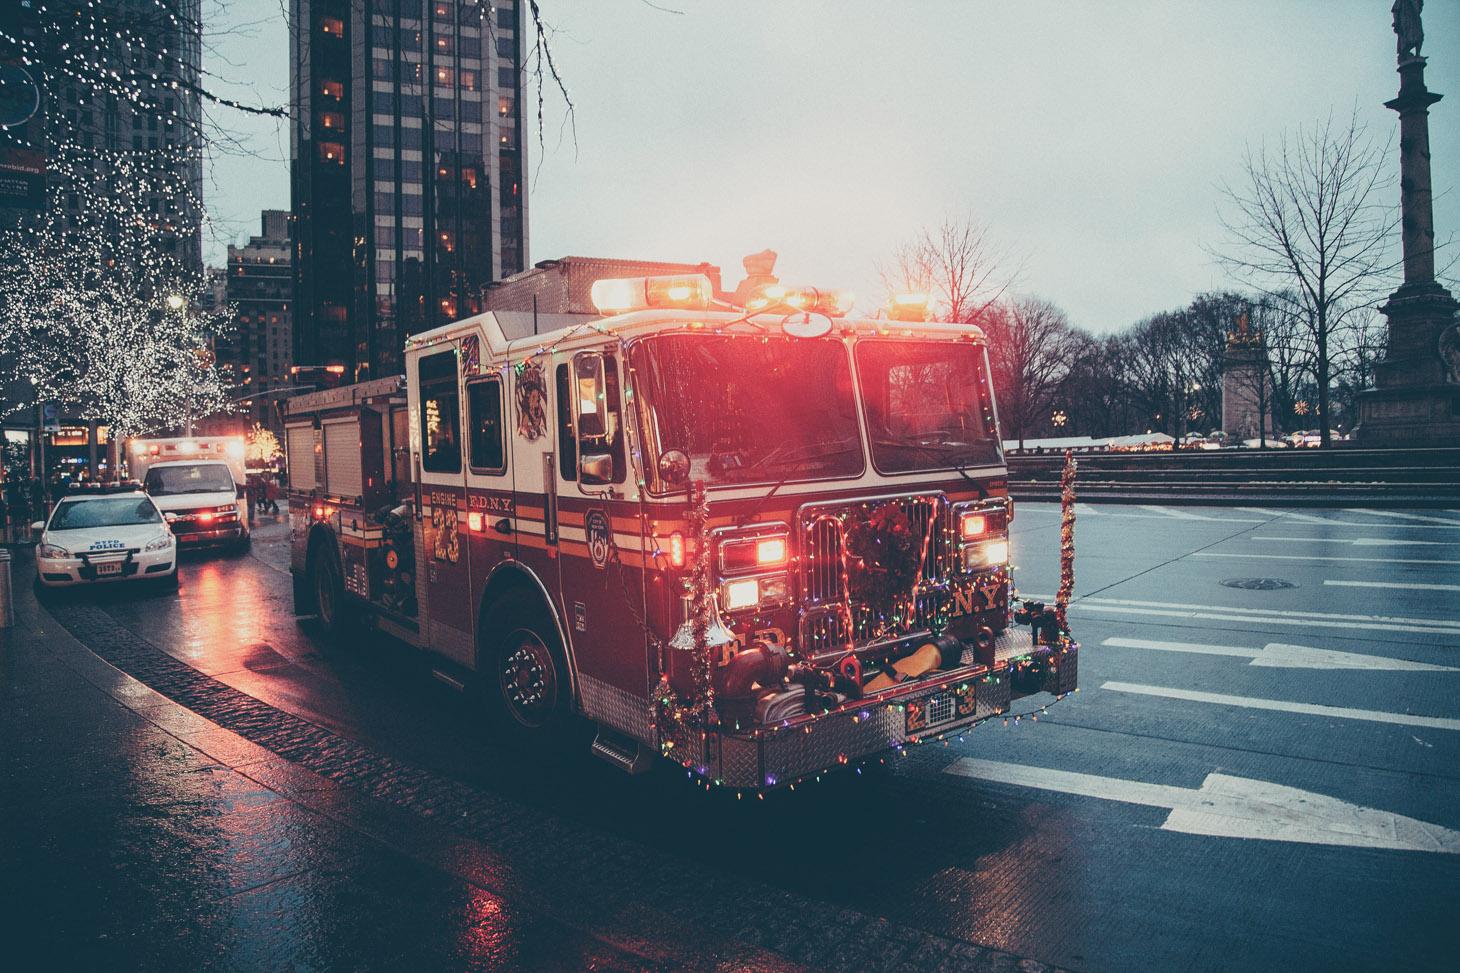 fireman-car